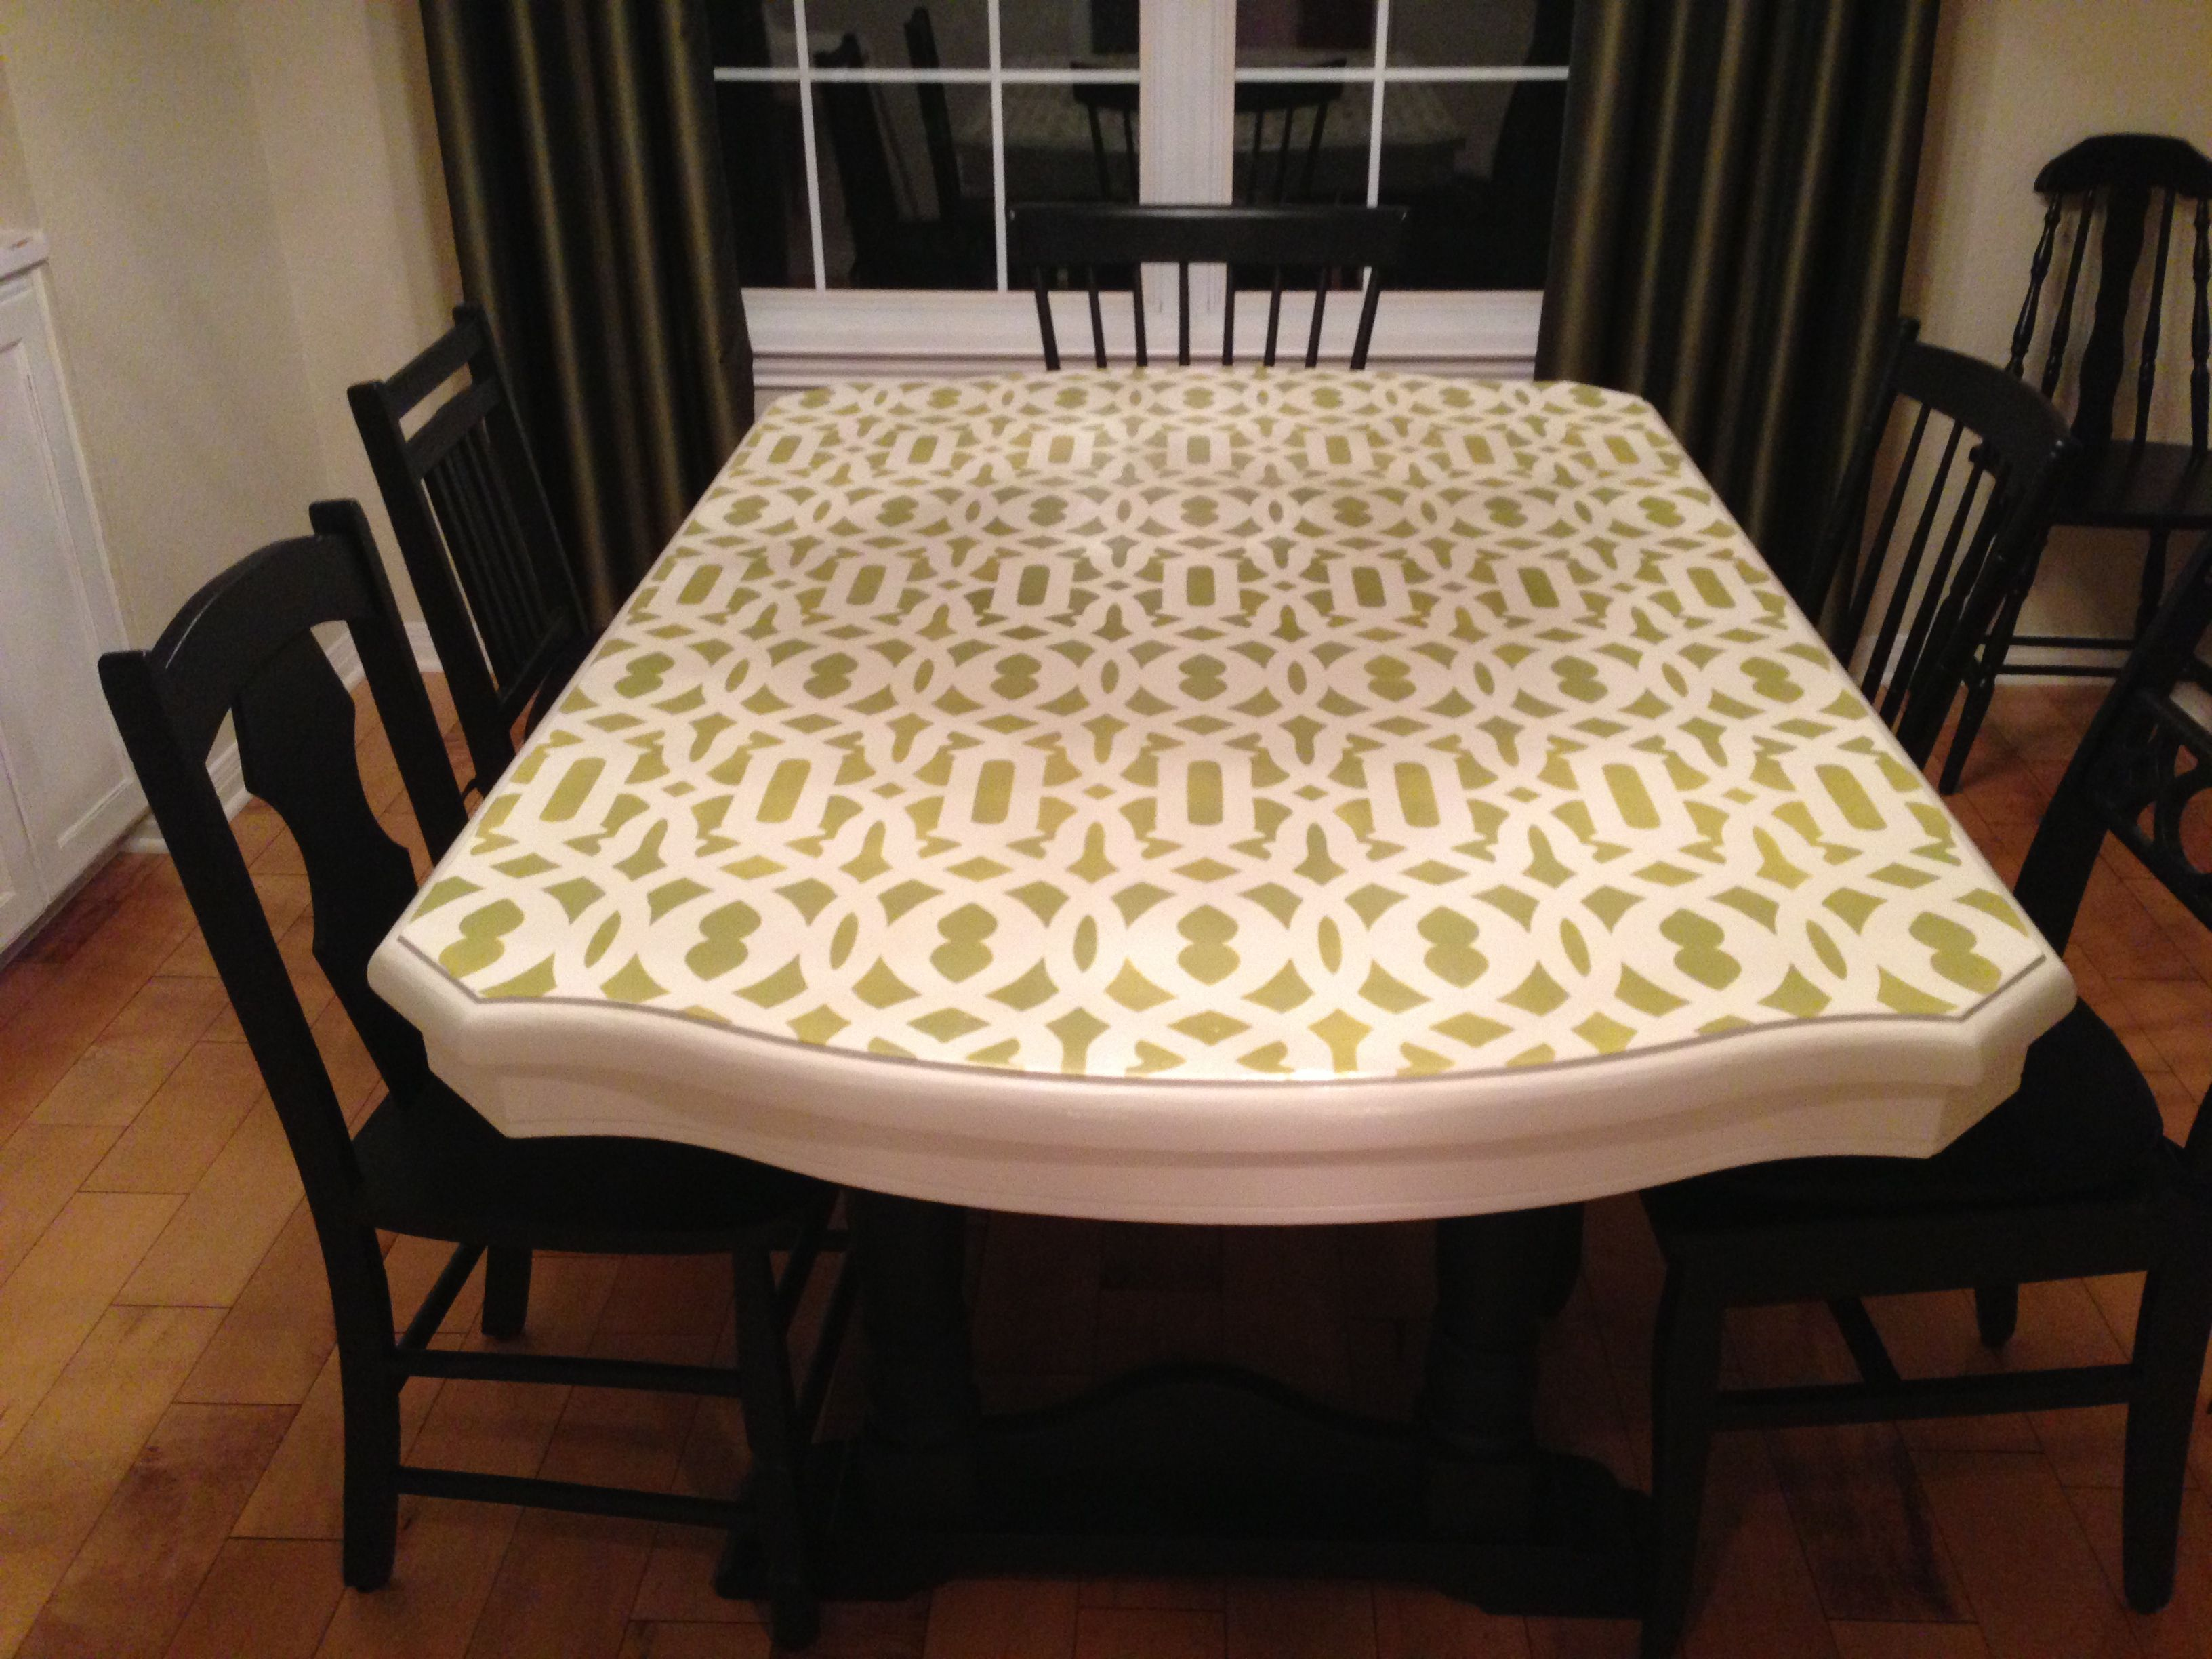 My new rad dining table!